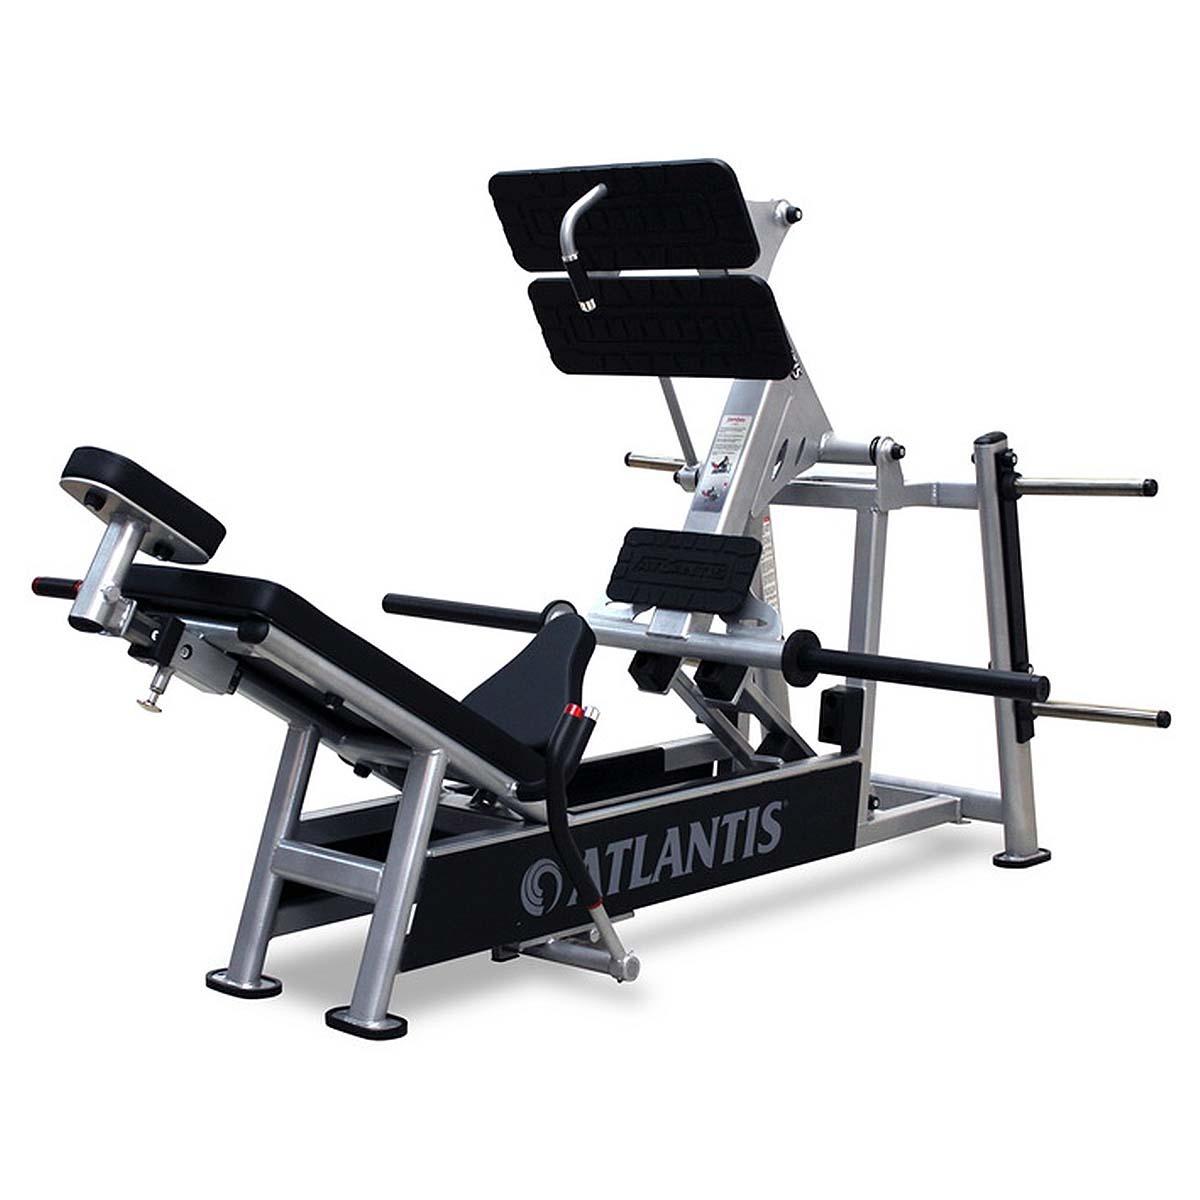 Surrey Strength Equipment - Atlantis Precision Series - Lifestyle Equipment